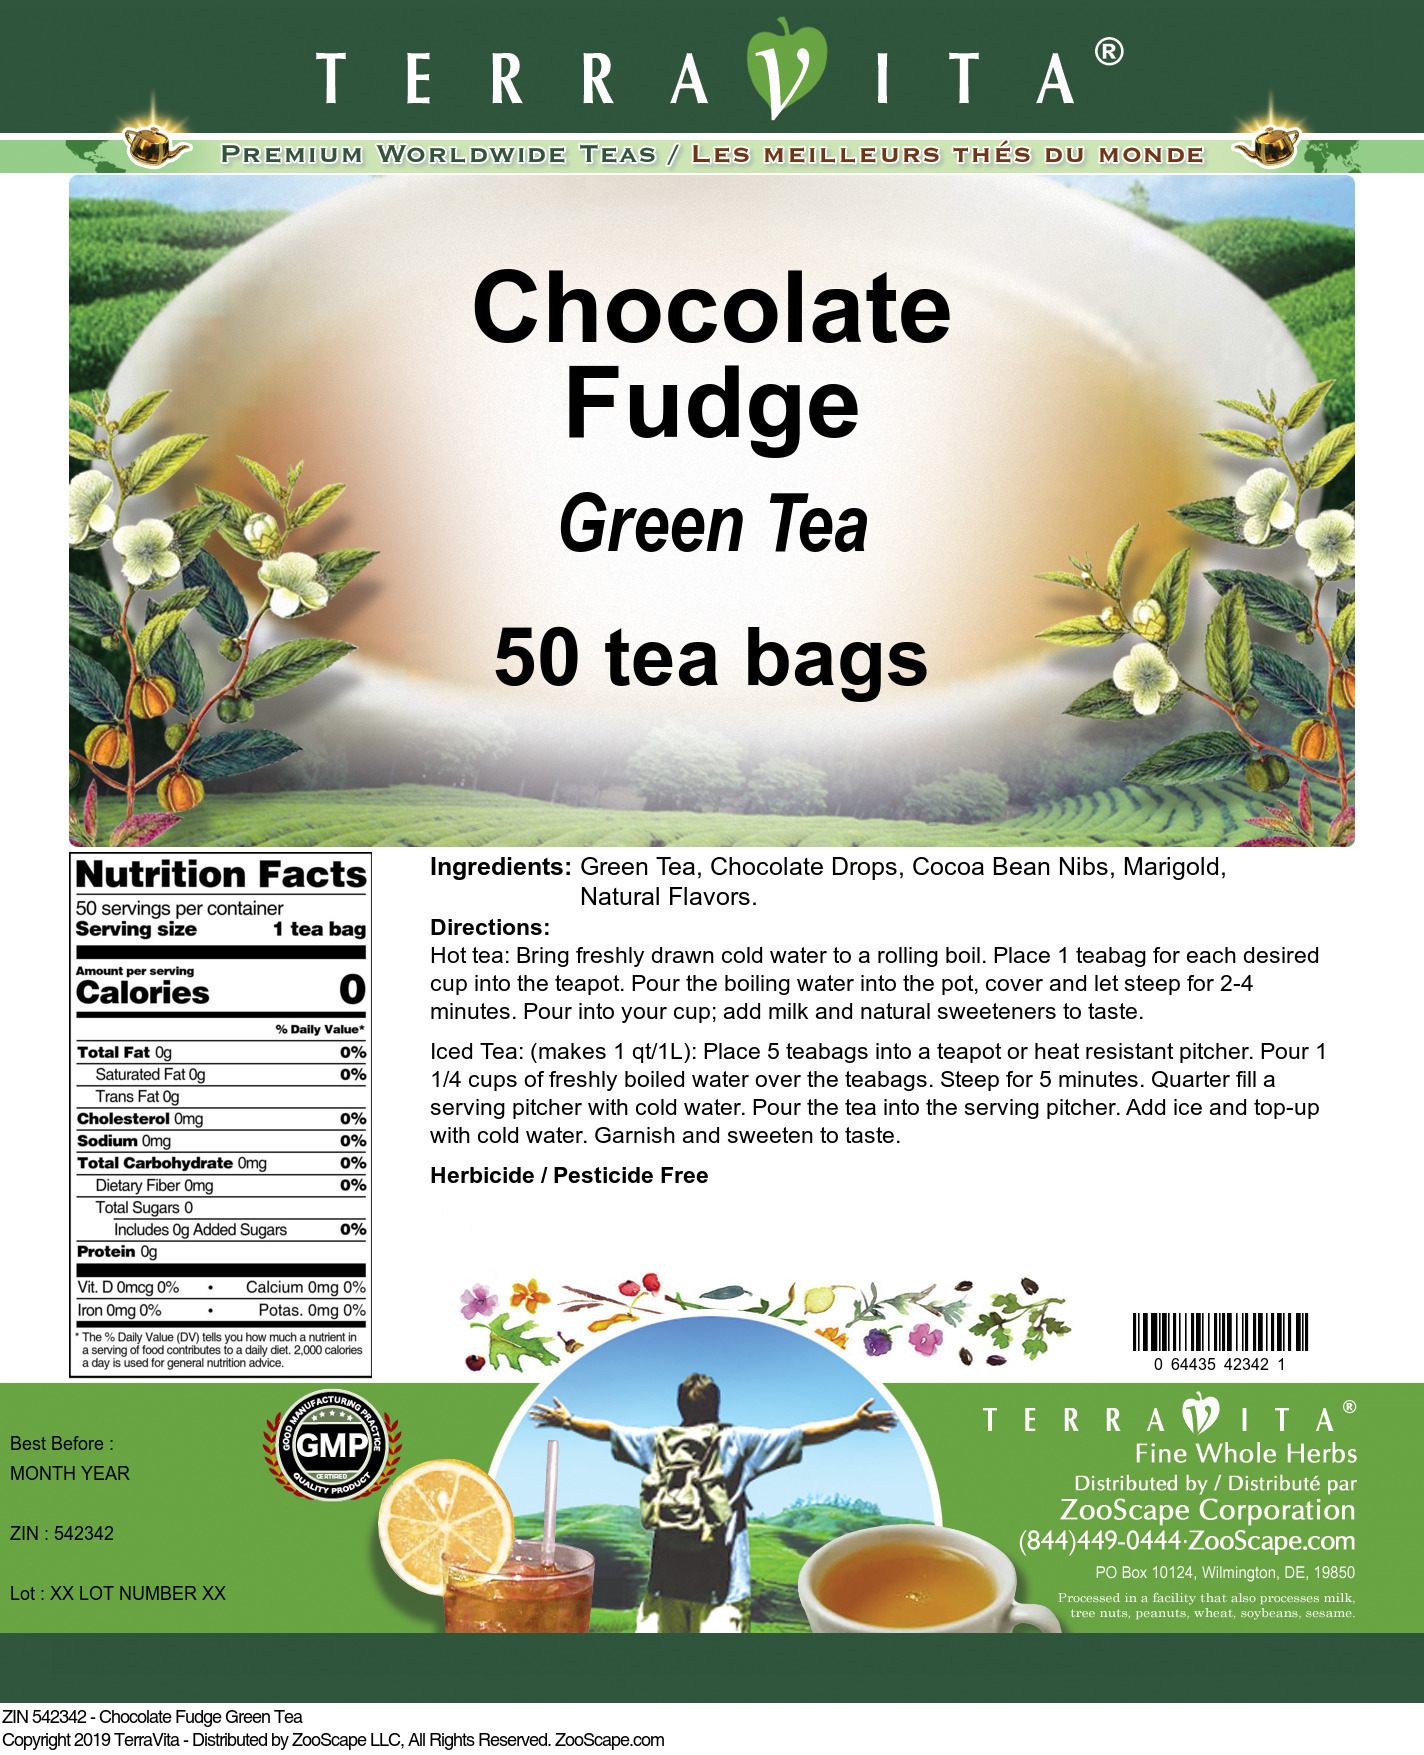 Chocolate Fudge Green Tea